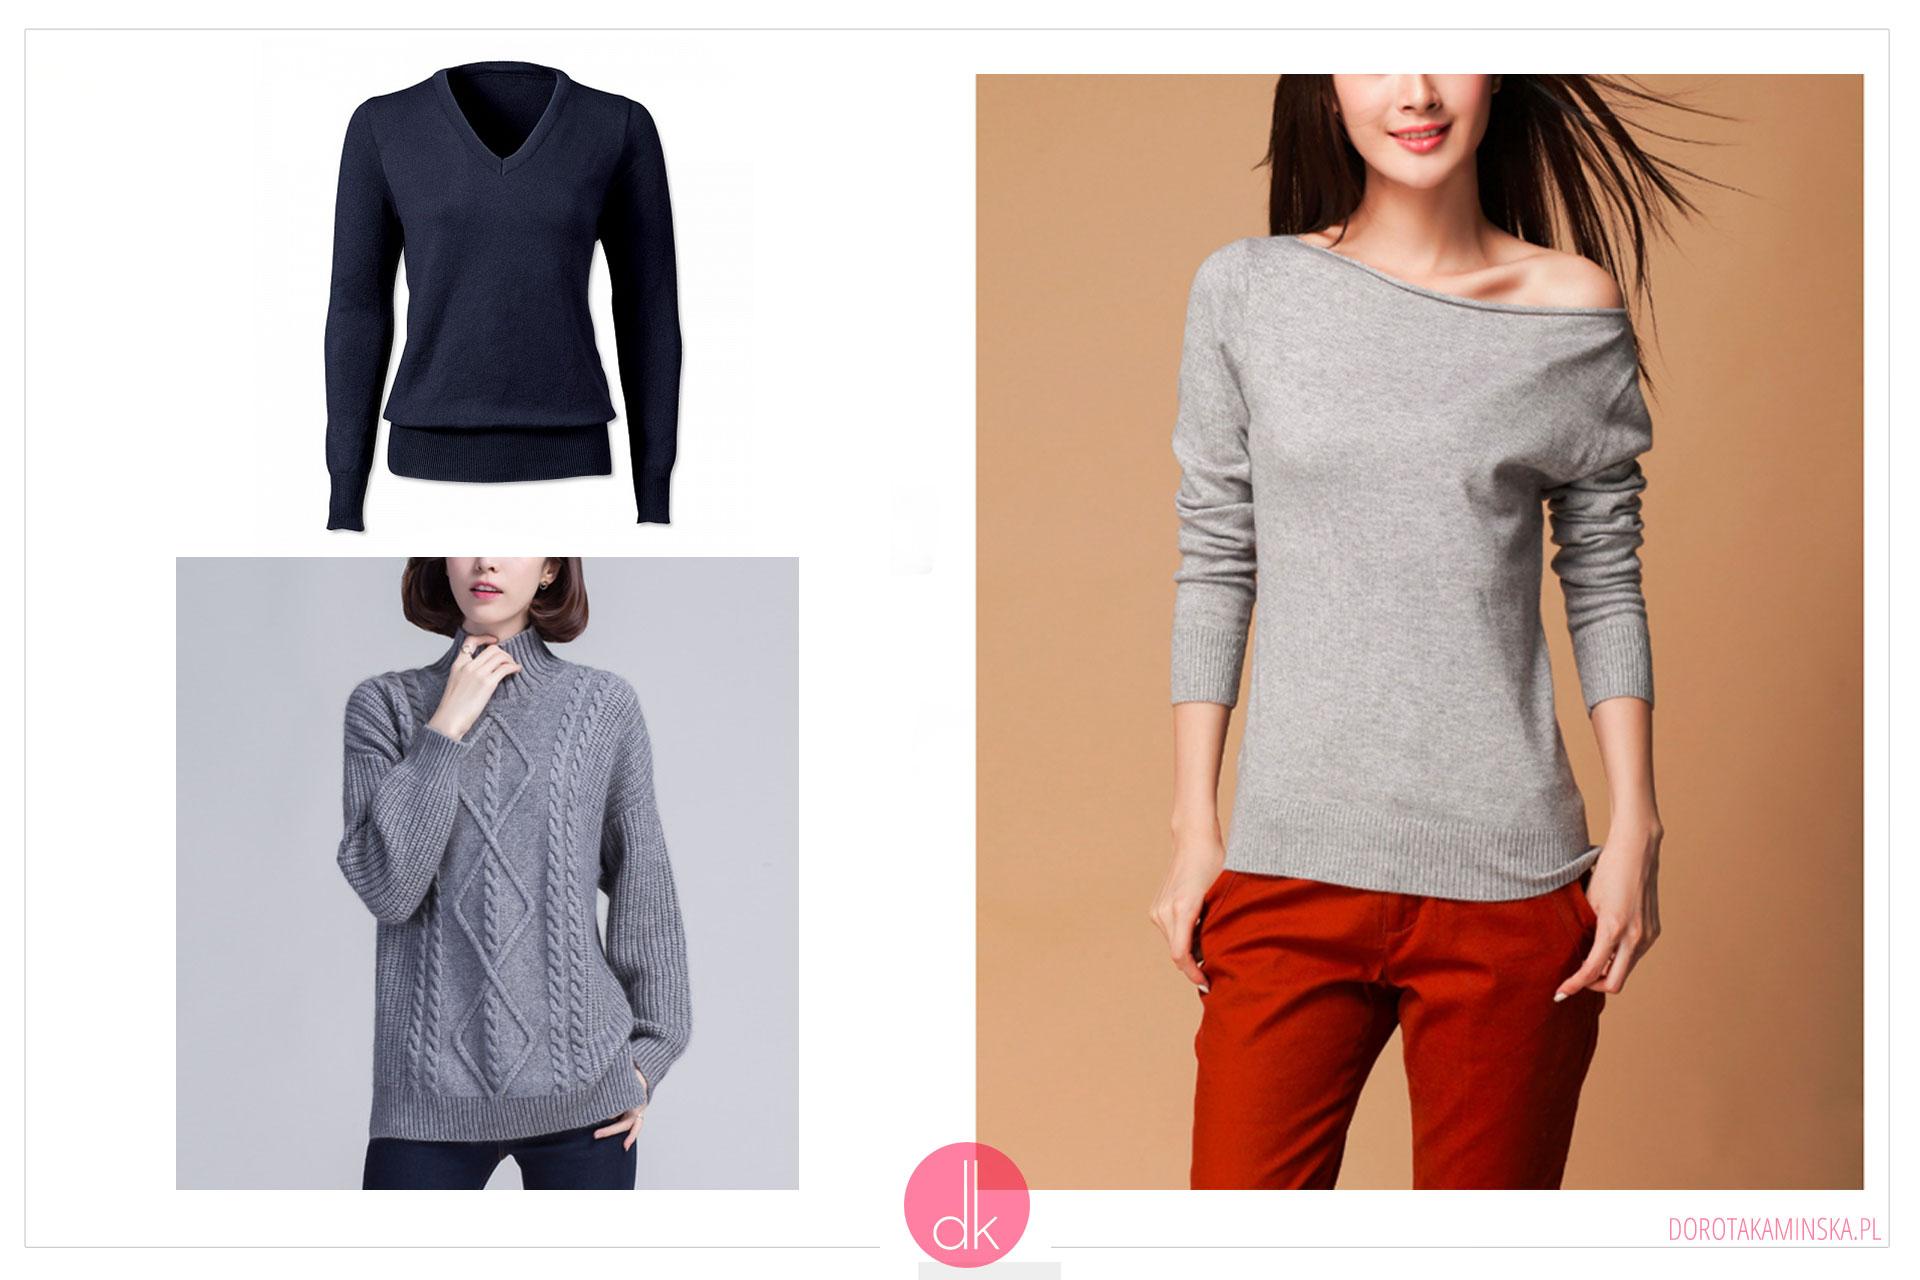 Swetry na zimę - garderoba kapsułowaSwetry na zimę 2017 - garderoba kapsułowa